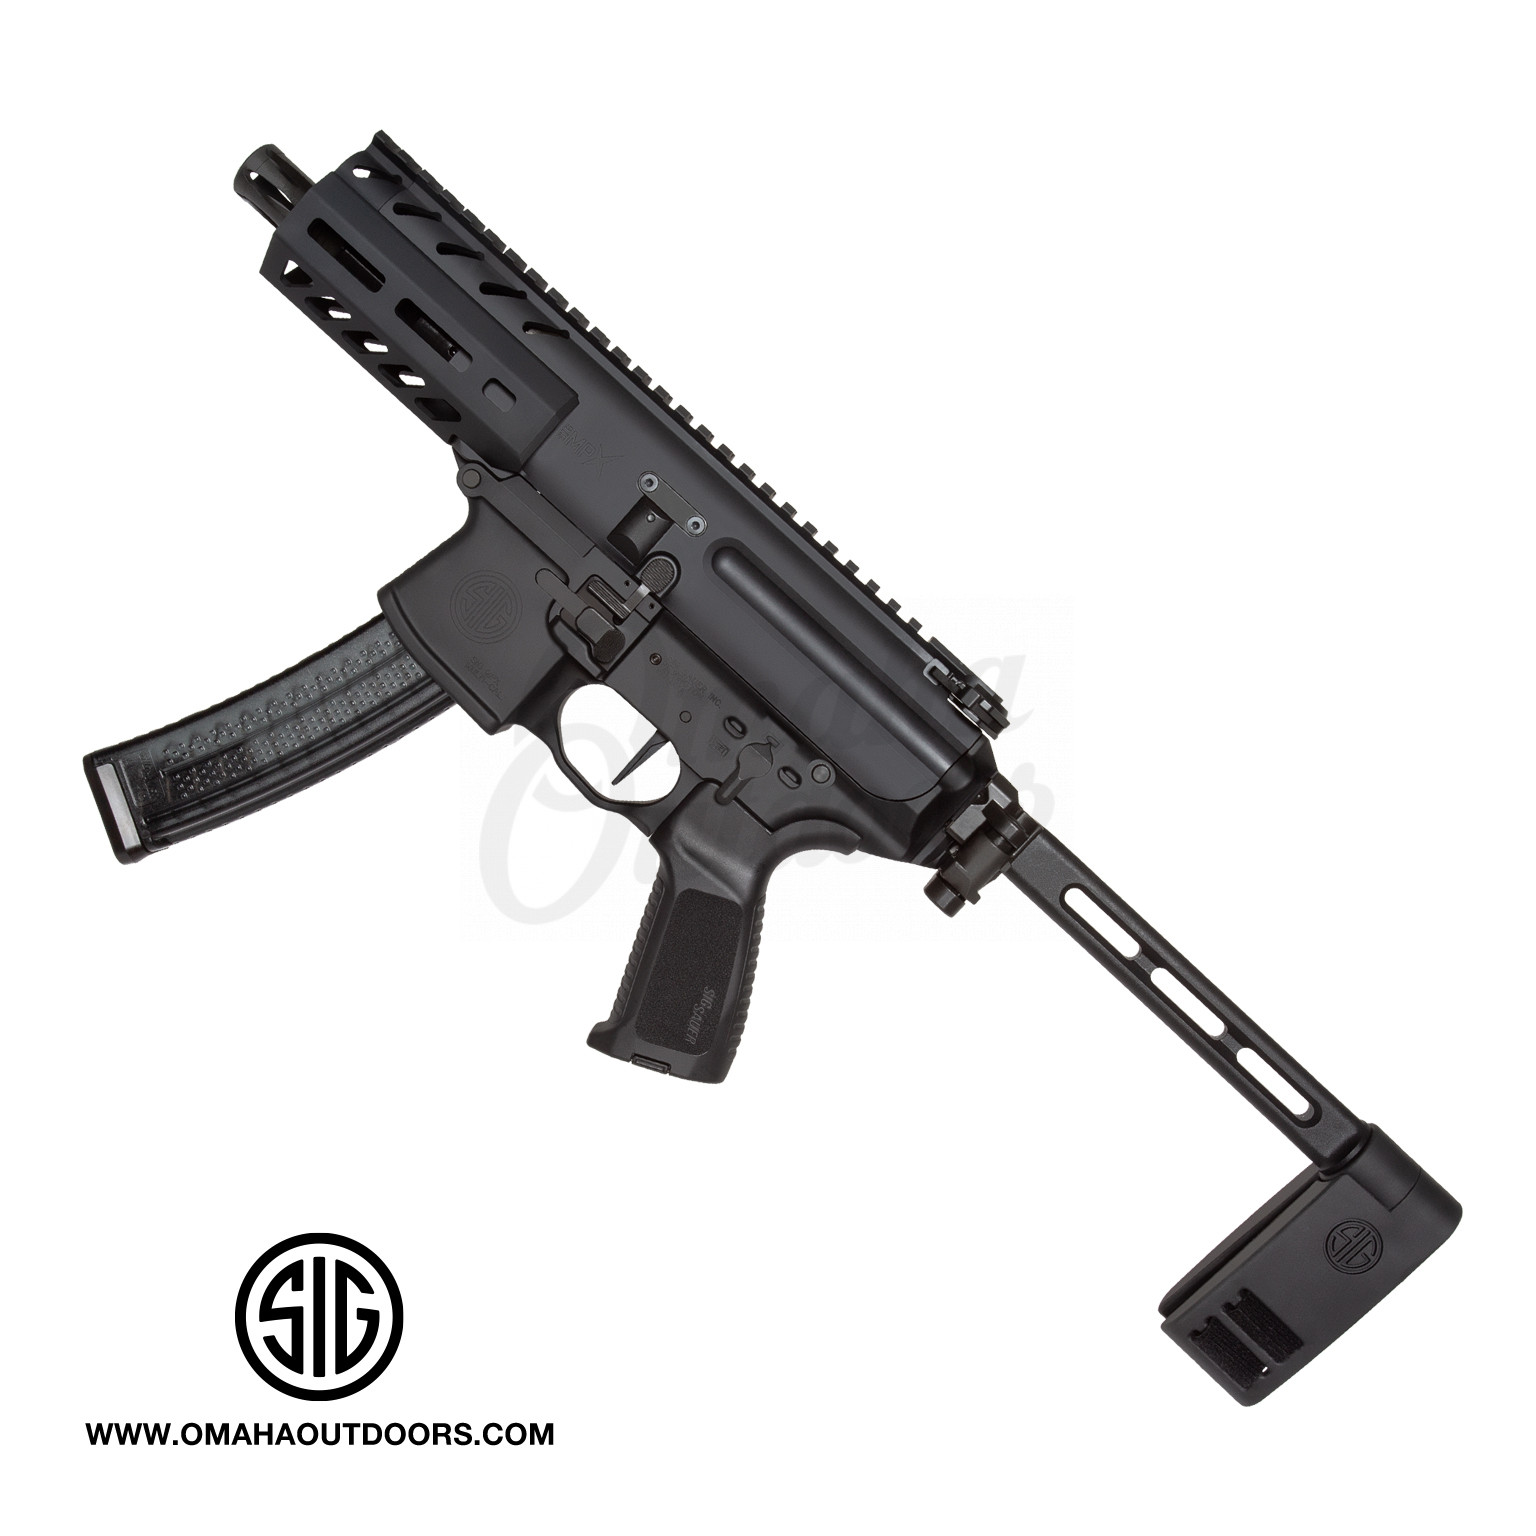 Sig Sauer MPX K Rifle Style Pistol 4 5″ 9mm 30 RD M-LOK PCB Brace PMPX-4B-9